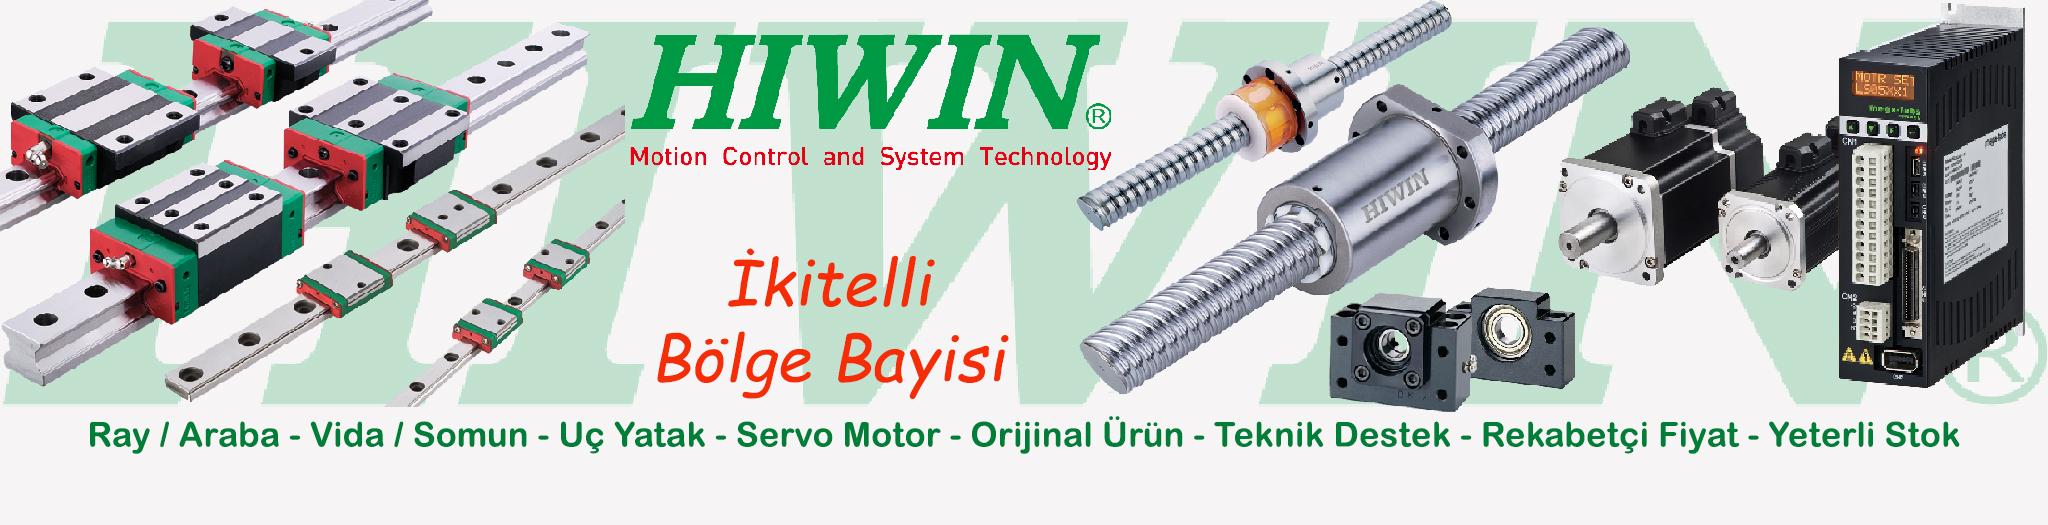 Hiwin Linear and Hiwin Mikrosystem �kitelli B�lge Bayisi